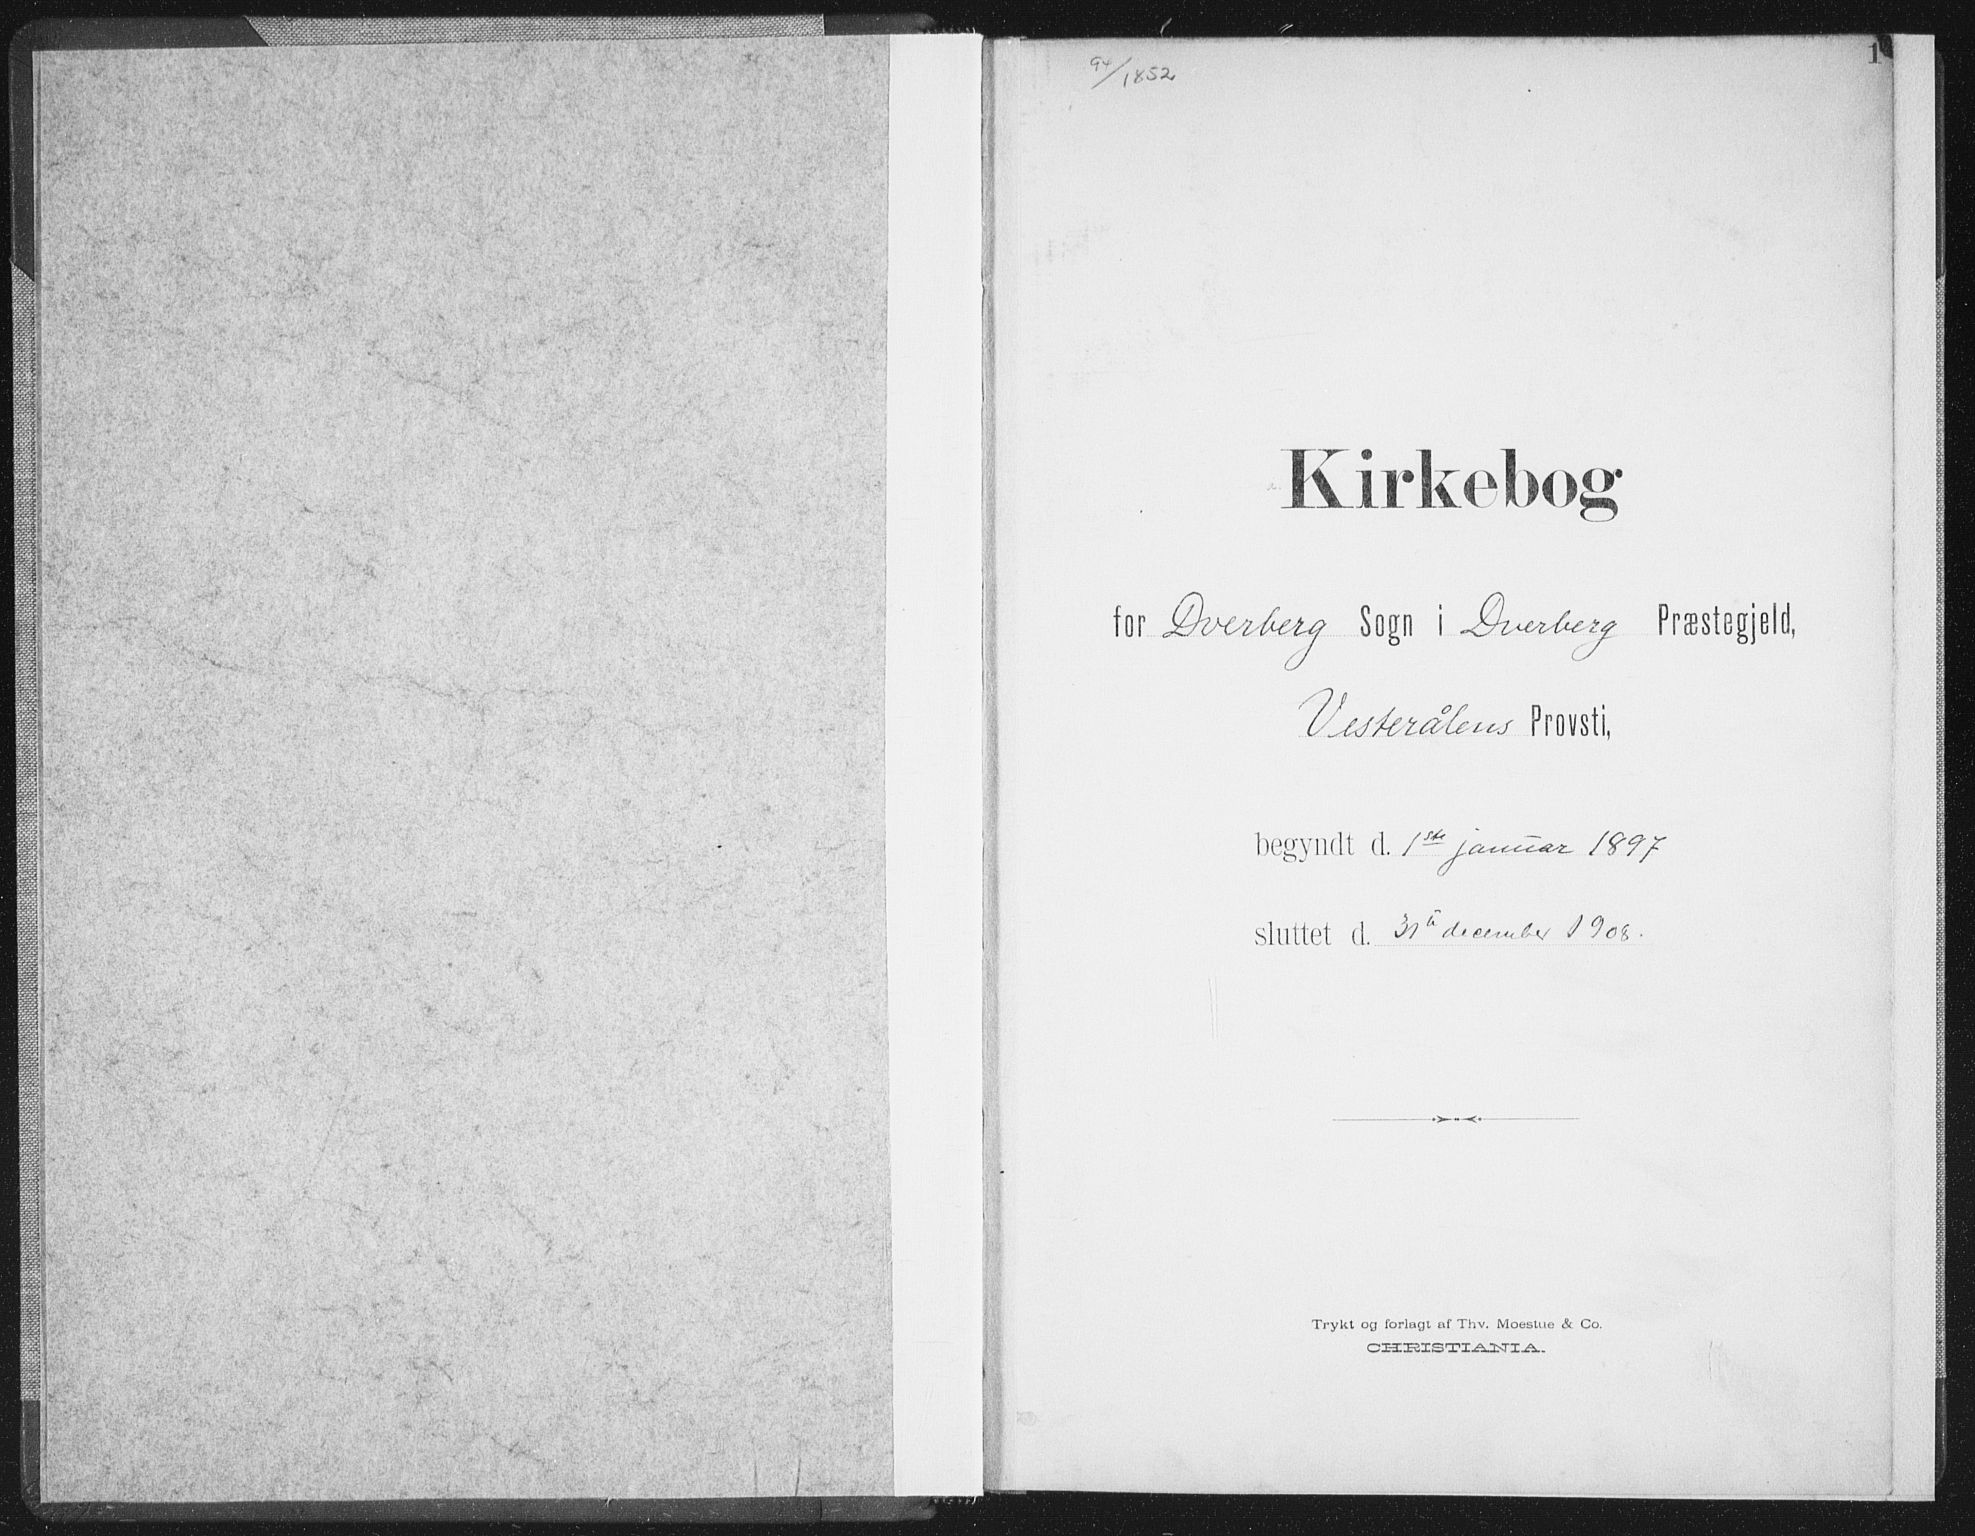 SAT, Ministerialprotokoller, klokkerbøker og fødselsregistre - Nordland, 897/L1400: Ministerialbok nr. 897A07, 1897-1908, s. 1